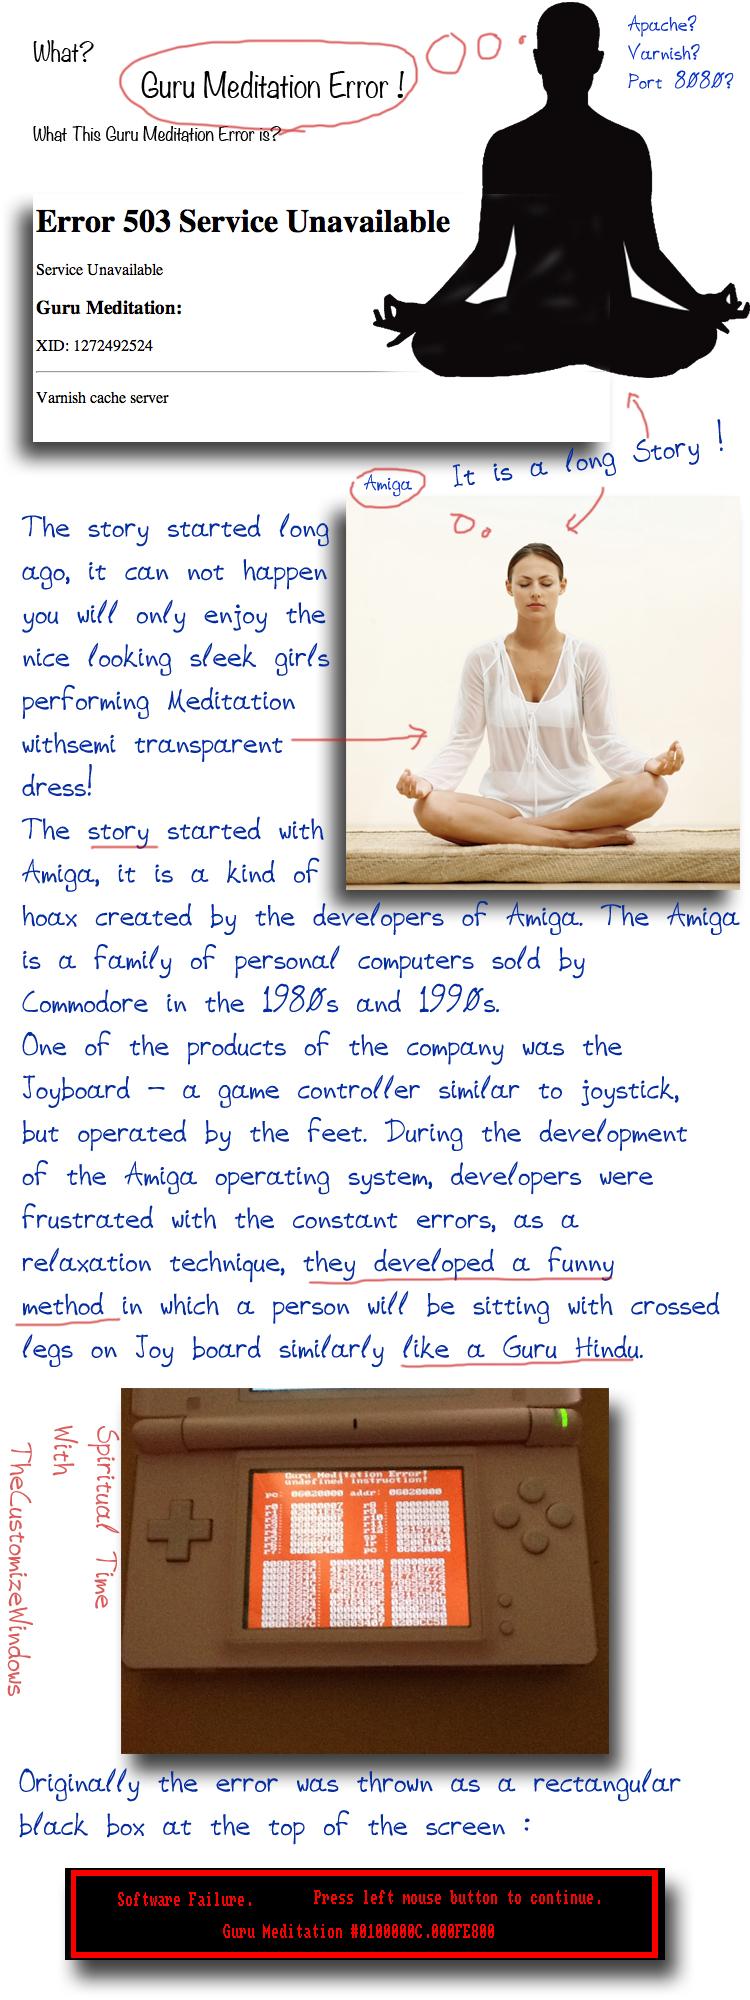 Guru-Meditation-Error